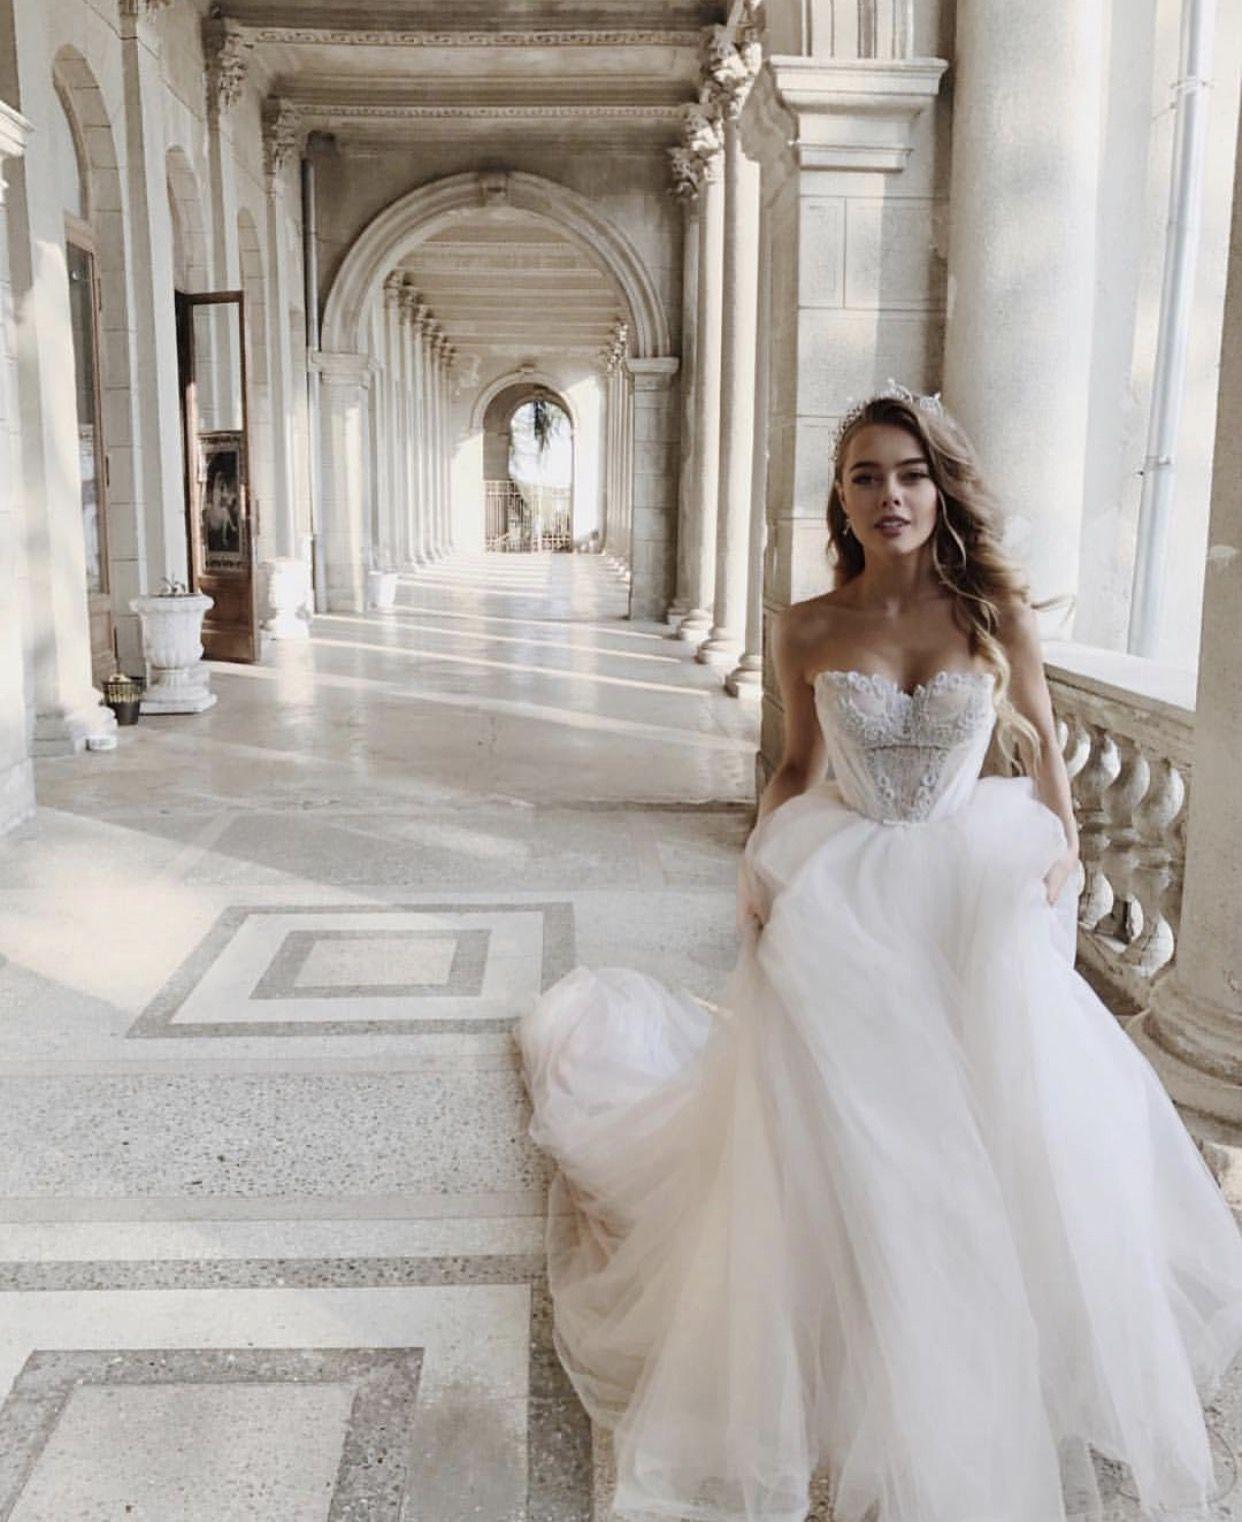 Covered shoulder wedding dresses  Pin by pnar on Kadın modası  Pinterest